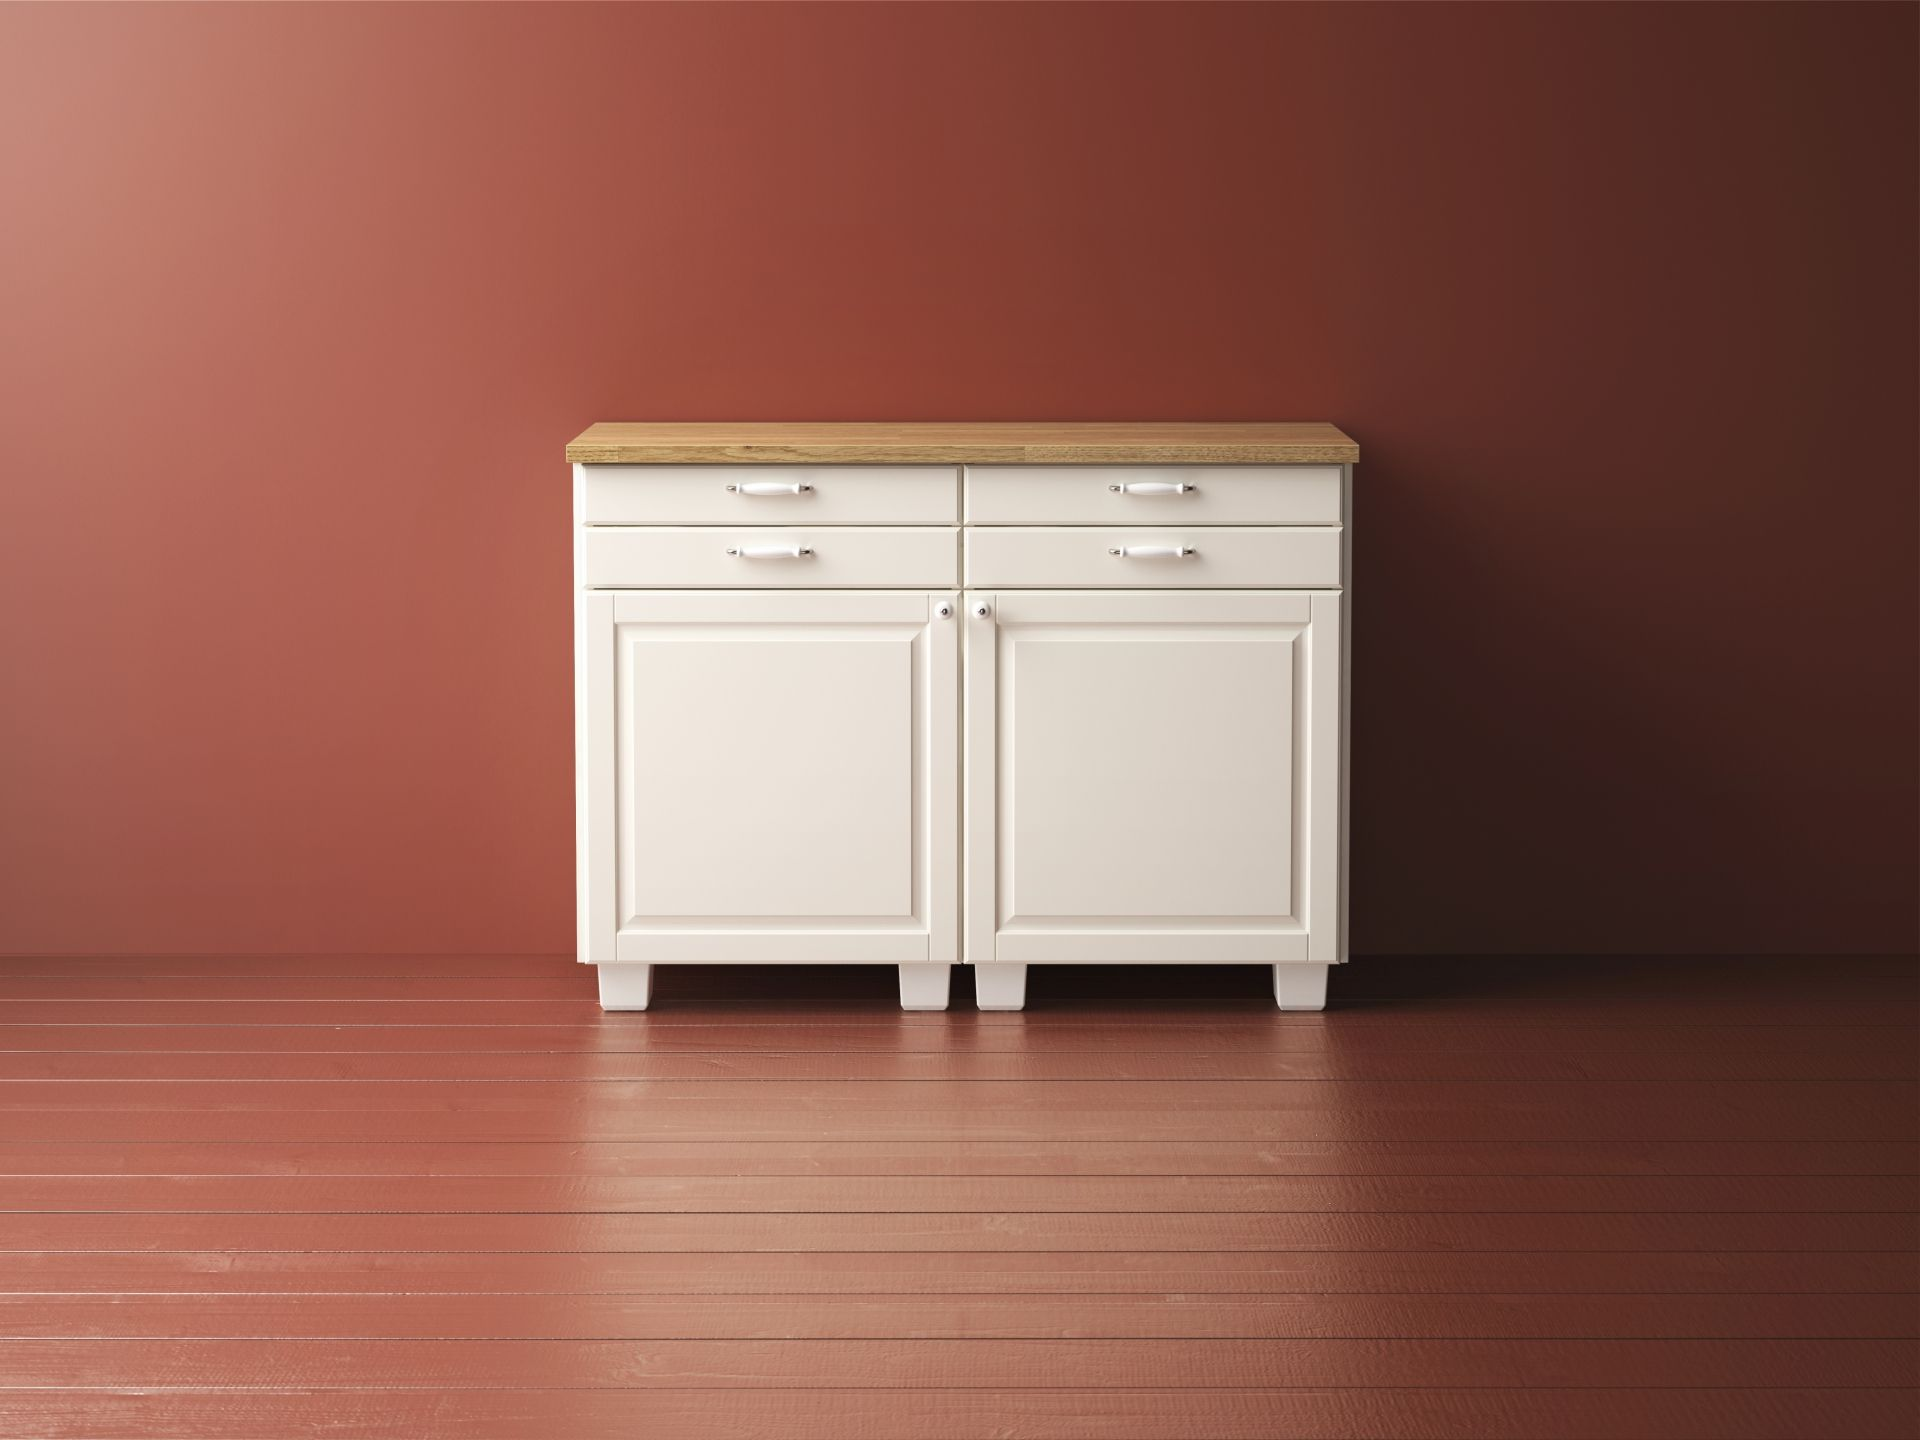 metod bodbyn opbergkast ikeacatalogus nieuw 2017 ikea ikeanl kast woonkamer keuken. Black Bedroom Furniture Sets. Home Design Ideas